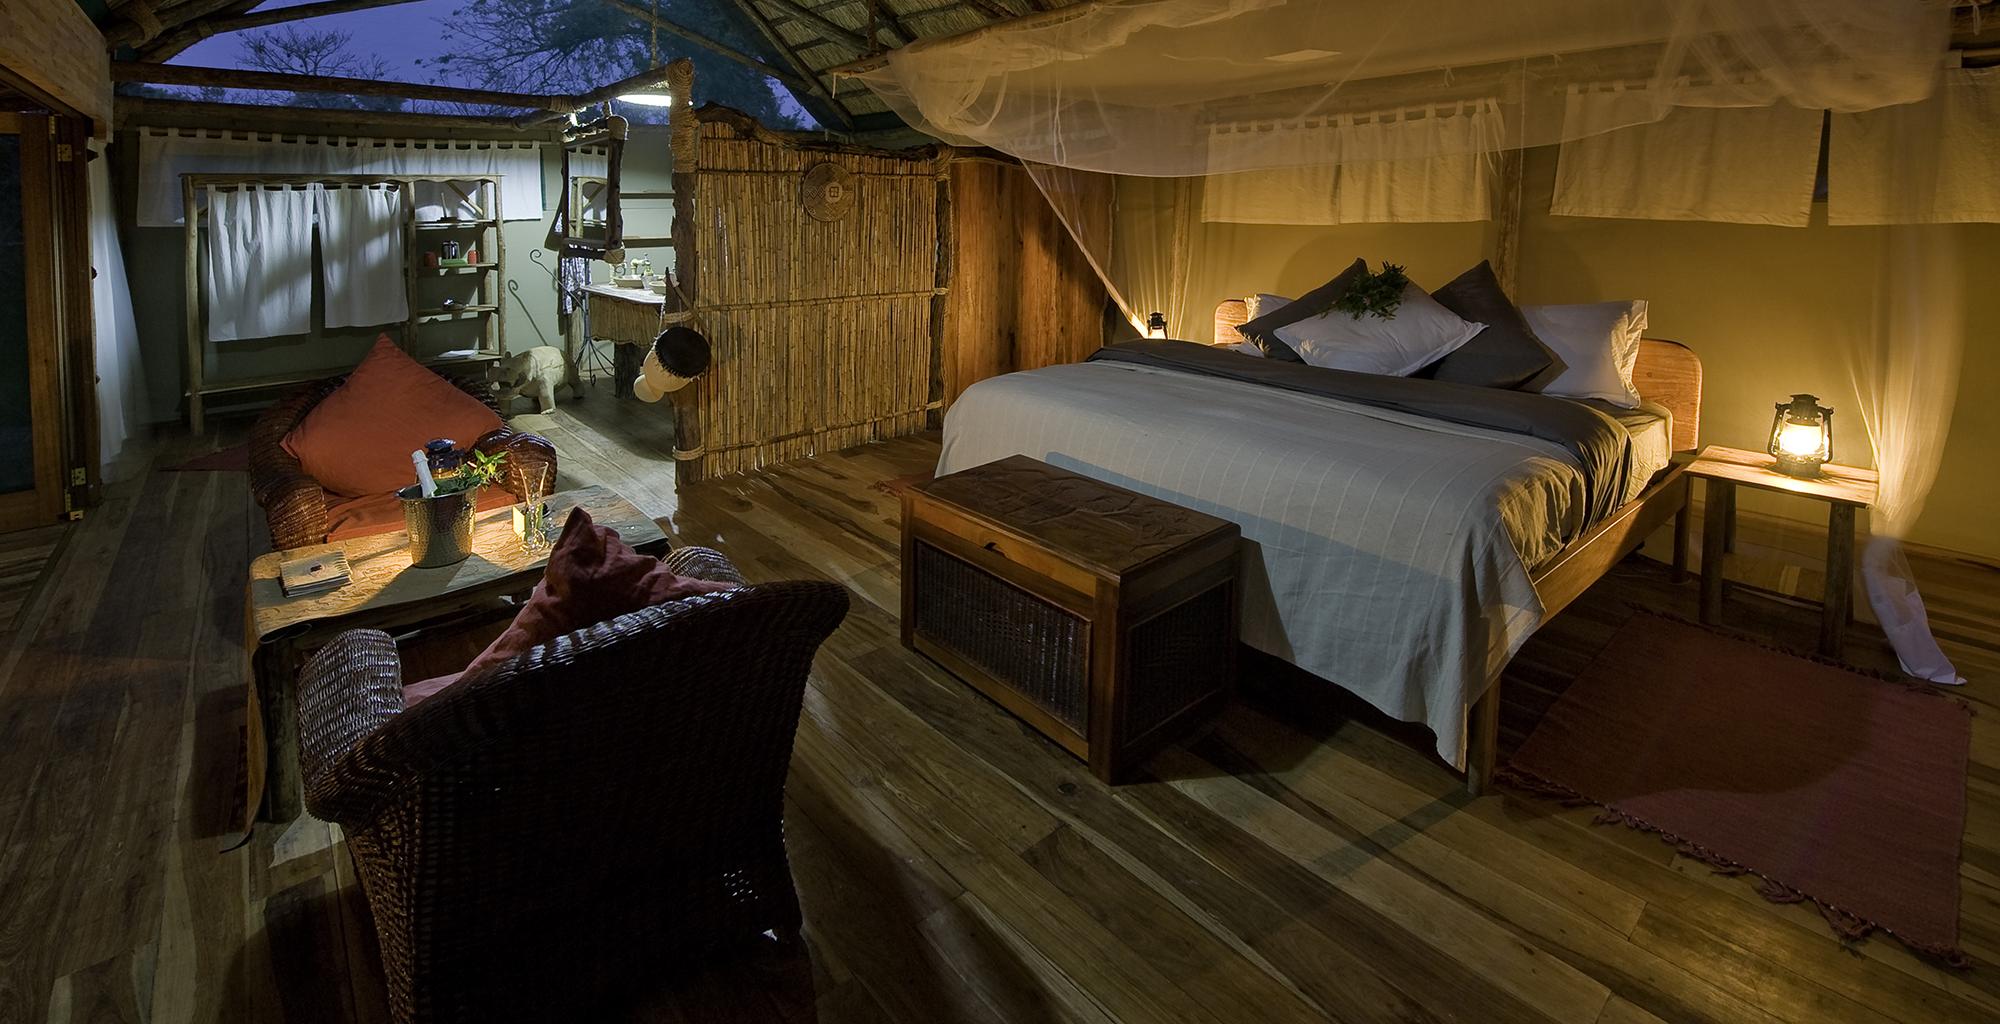 Malawi-Liwonde-National-Park-Mvuu-Lodge-Bedroom